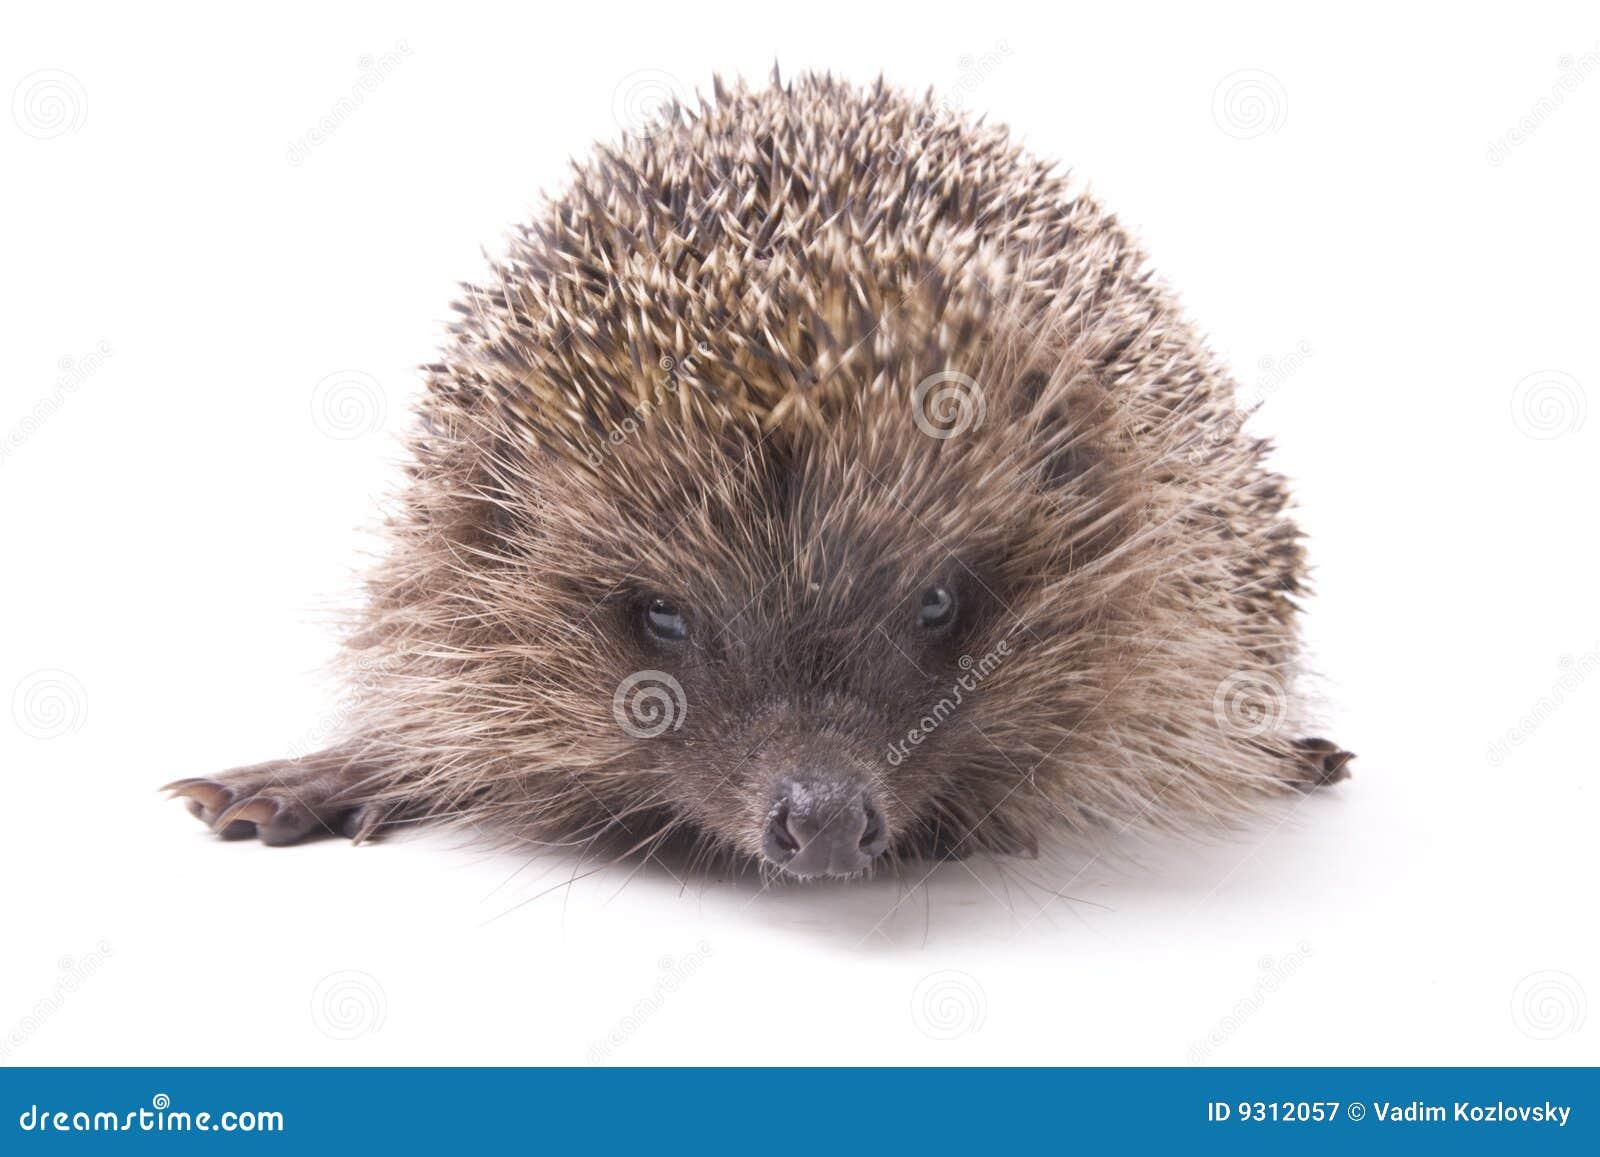 Hedgehoge